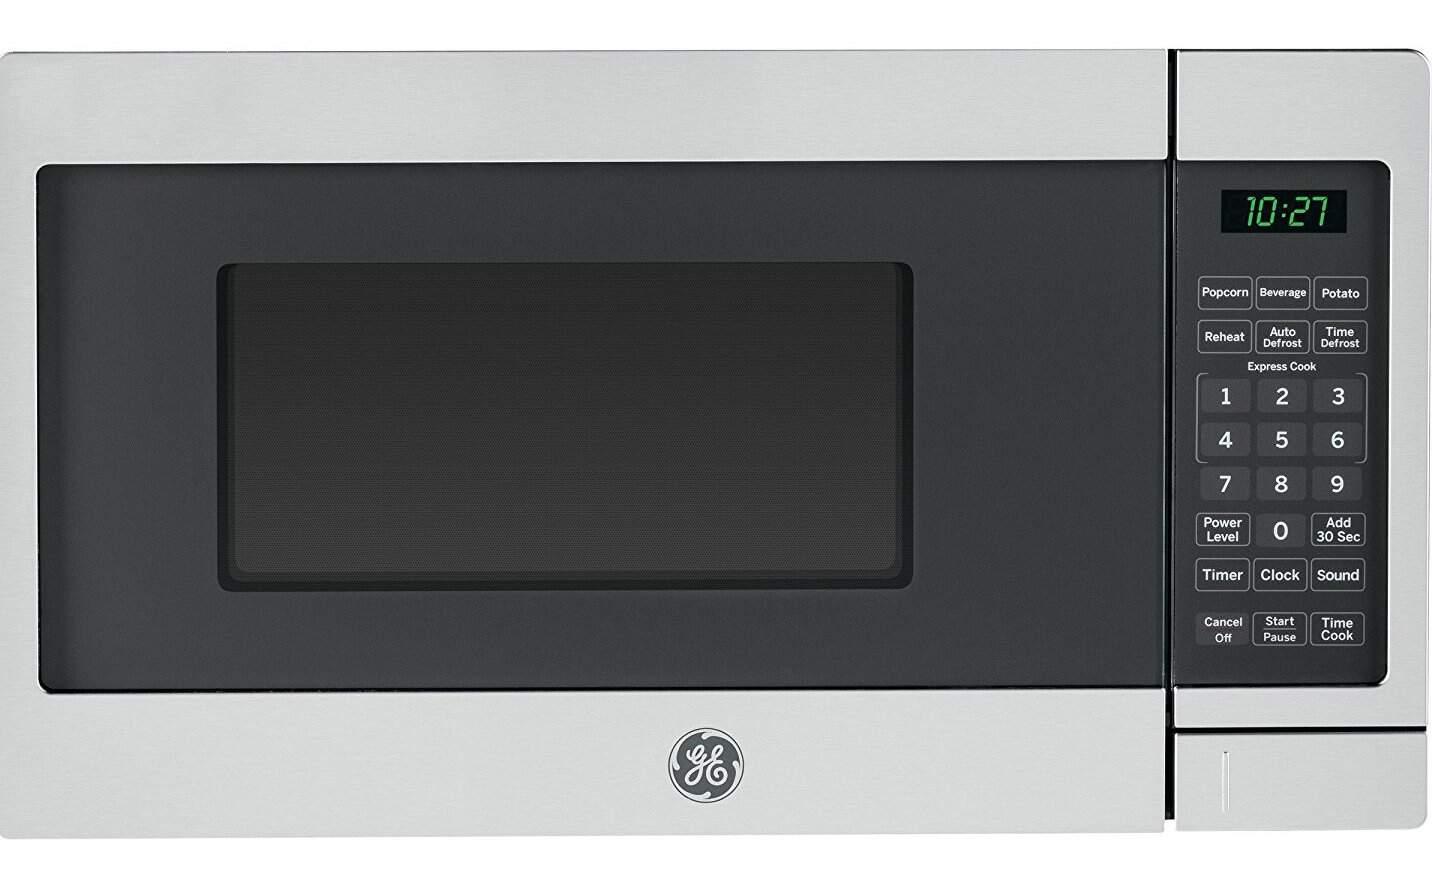 Compact Microwave Bestmicrowave